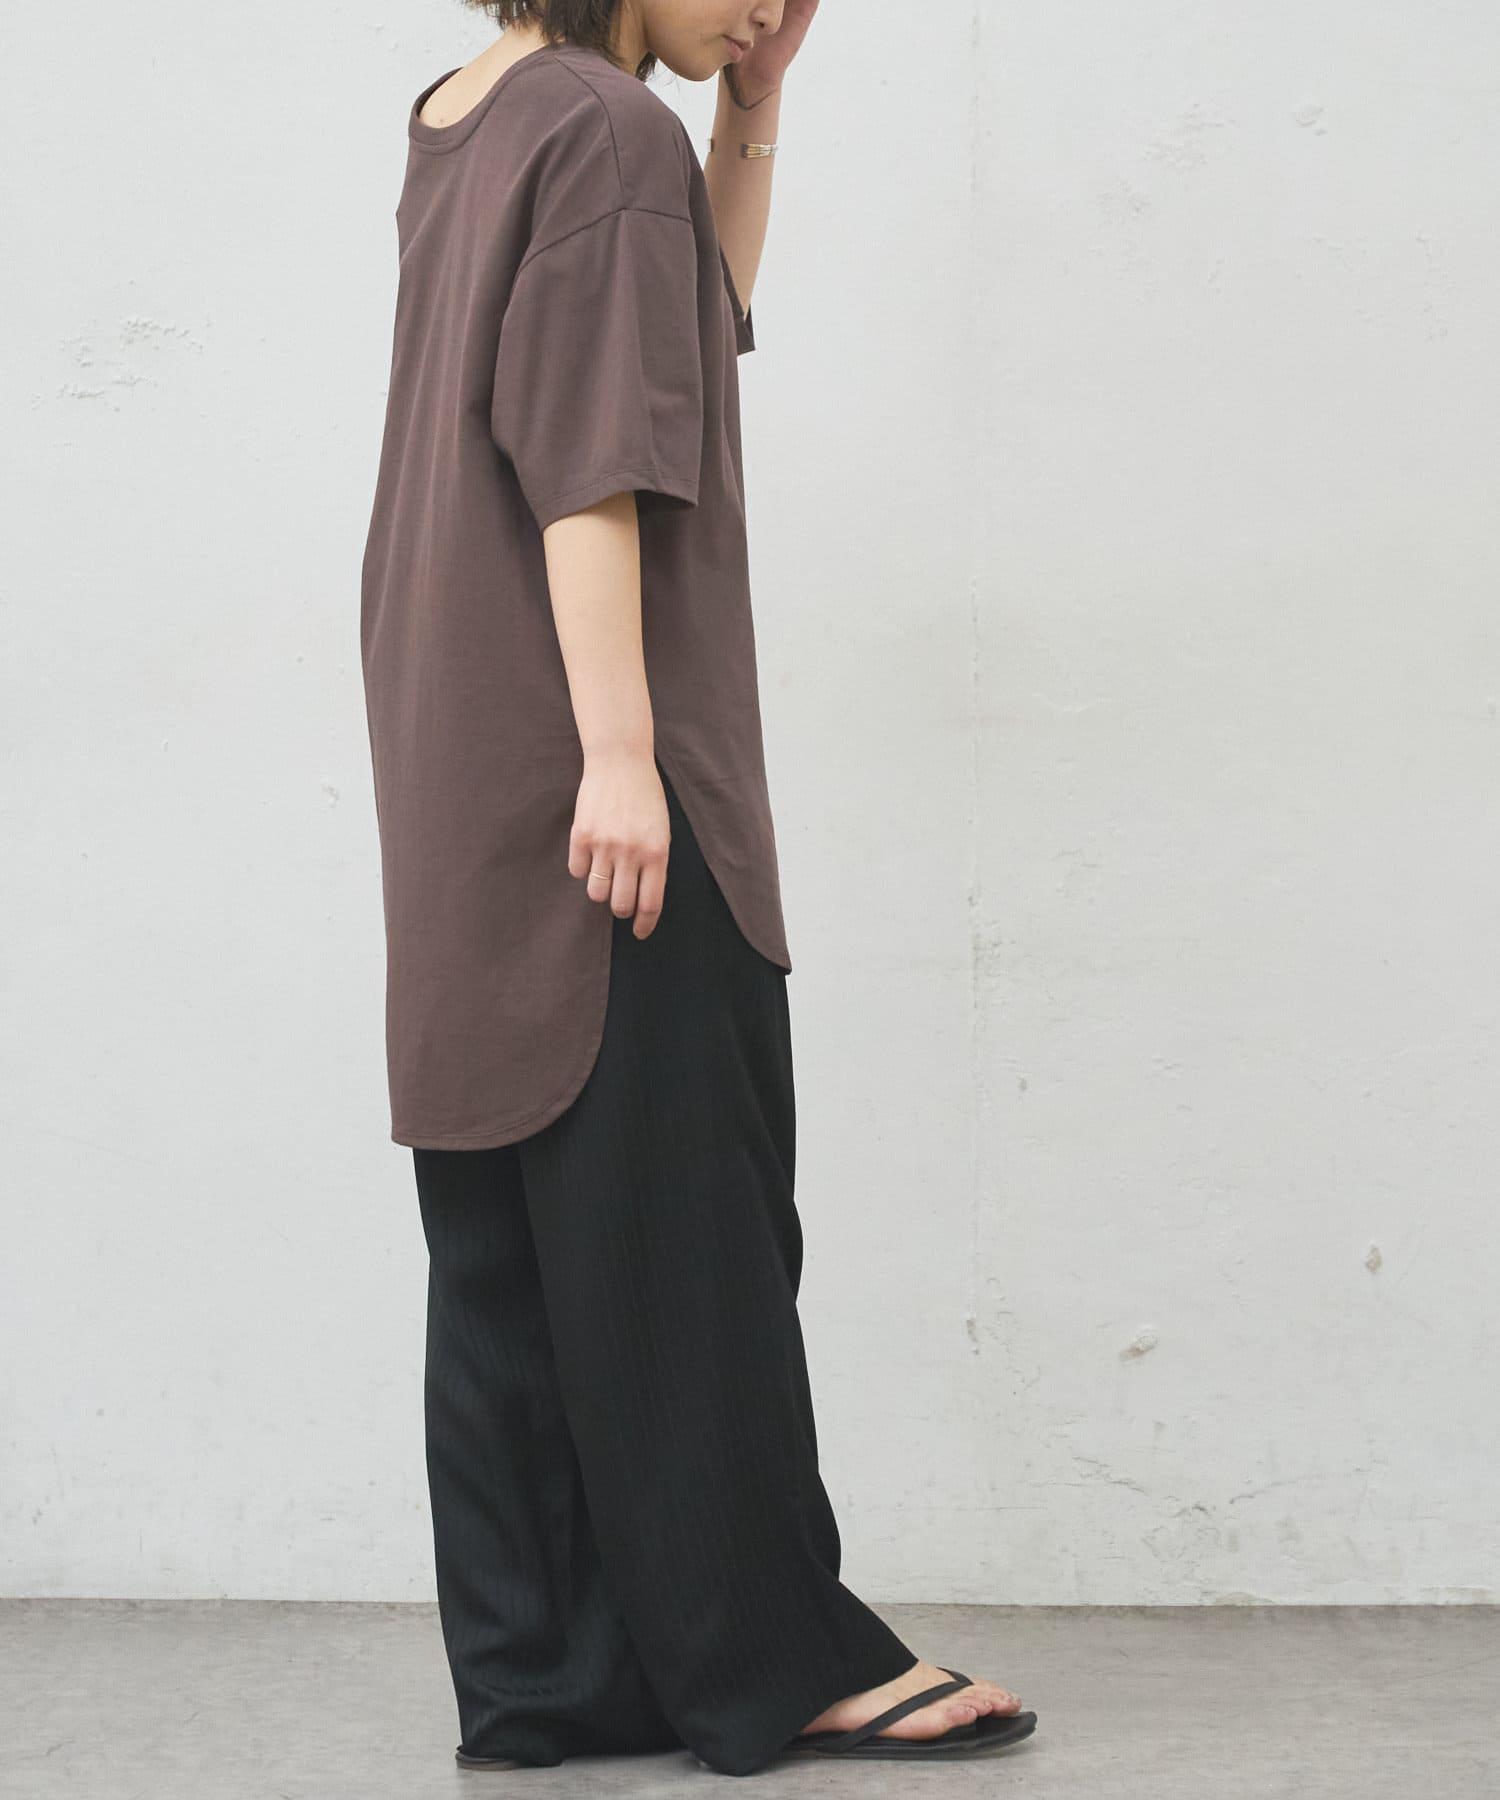 BONbazaar(ボンバザール) ラウンドワイド無地Tシャツ◆